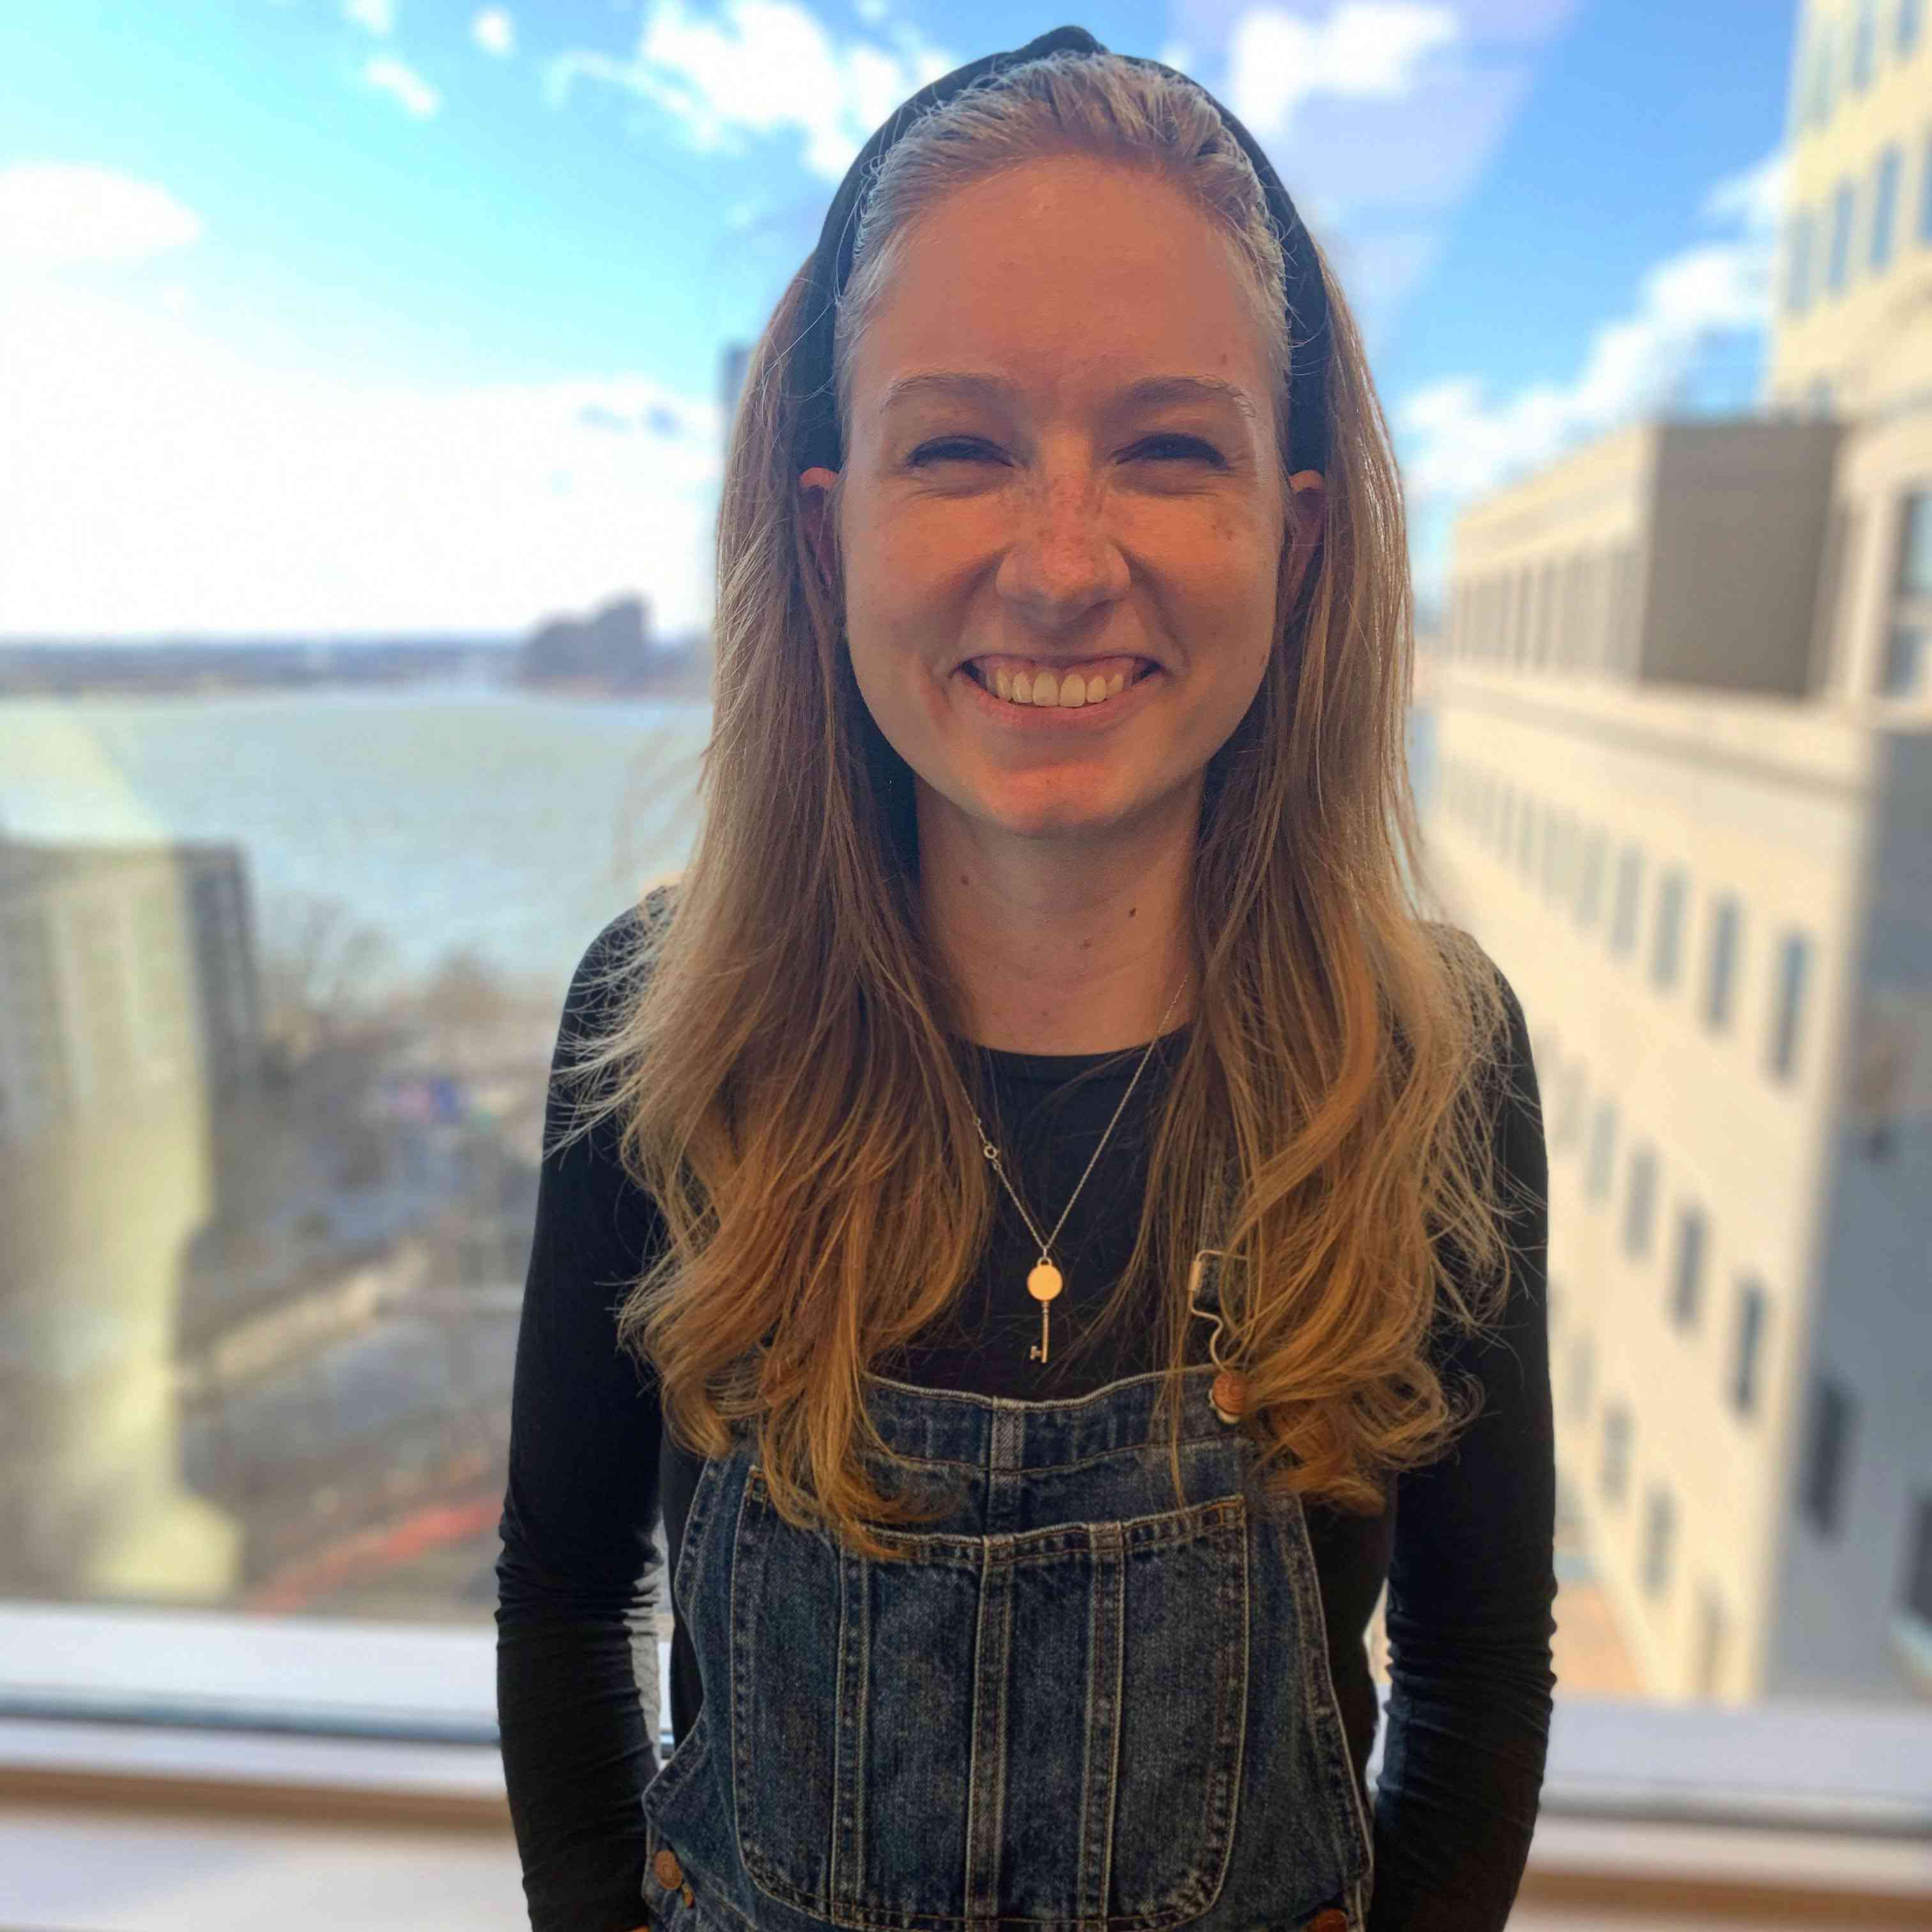 Lauren Phillips - Lifestyle Editor, The Spruce